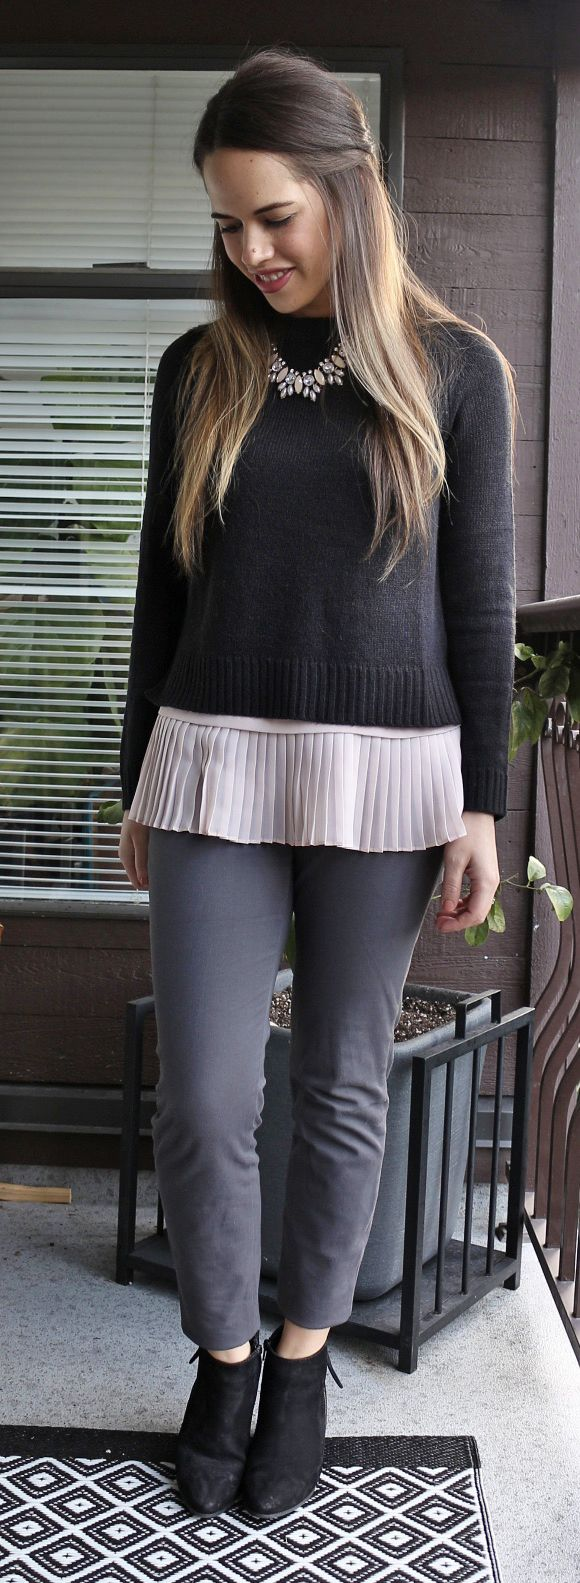 Jules in Flats - H&M Cropped Sweater, Smart Set Peplum, Old Navy Pixie Pants, Steve Madden Jaydun Booties